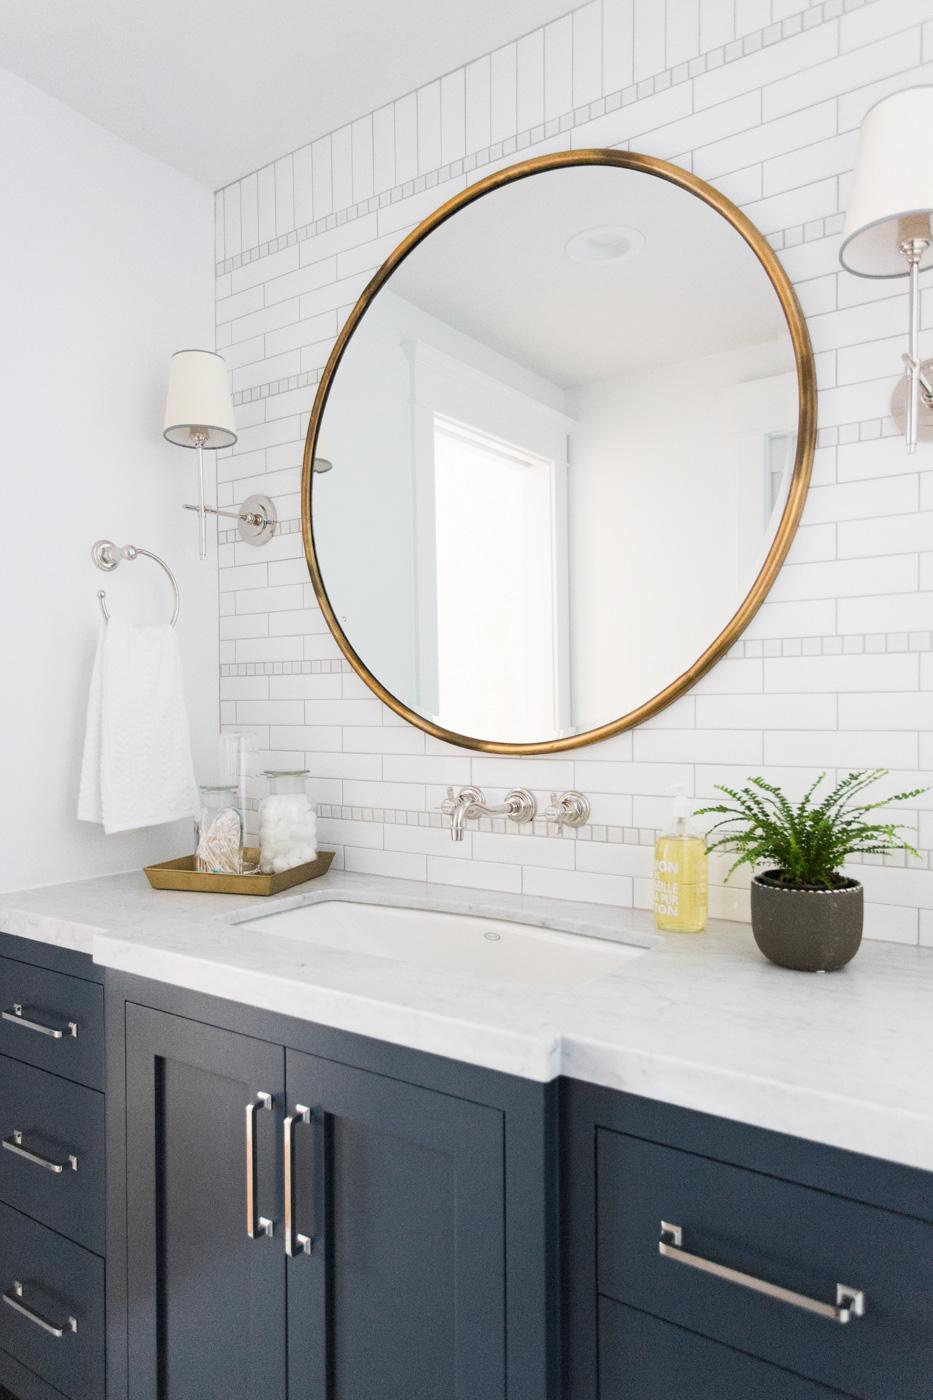 Benjamin+Moore+Gentleman's+Gray+Cabinets+and+striped+tile+detail+||+Studio+McGee.jpg